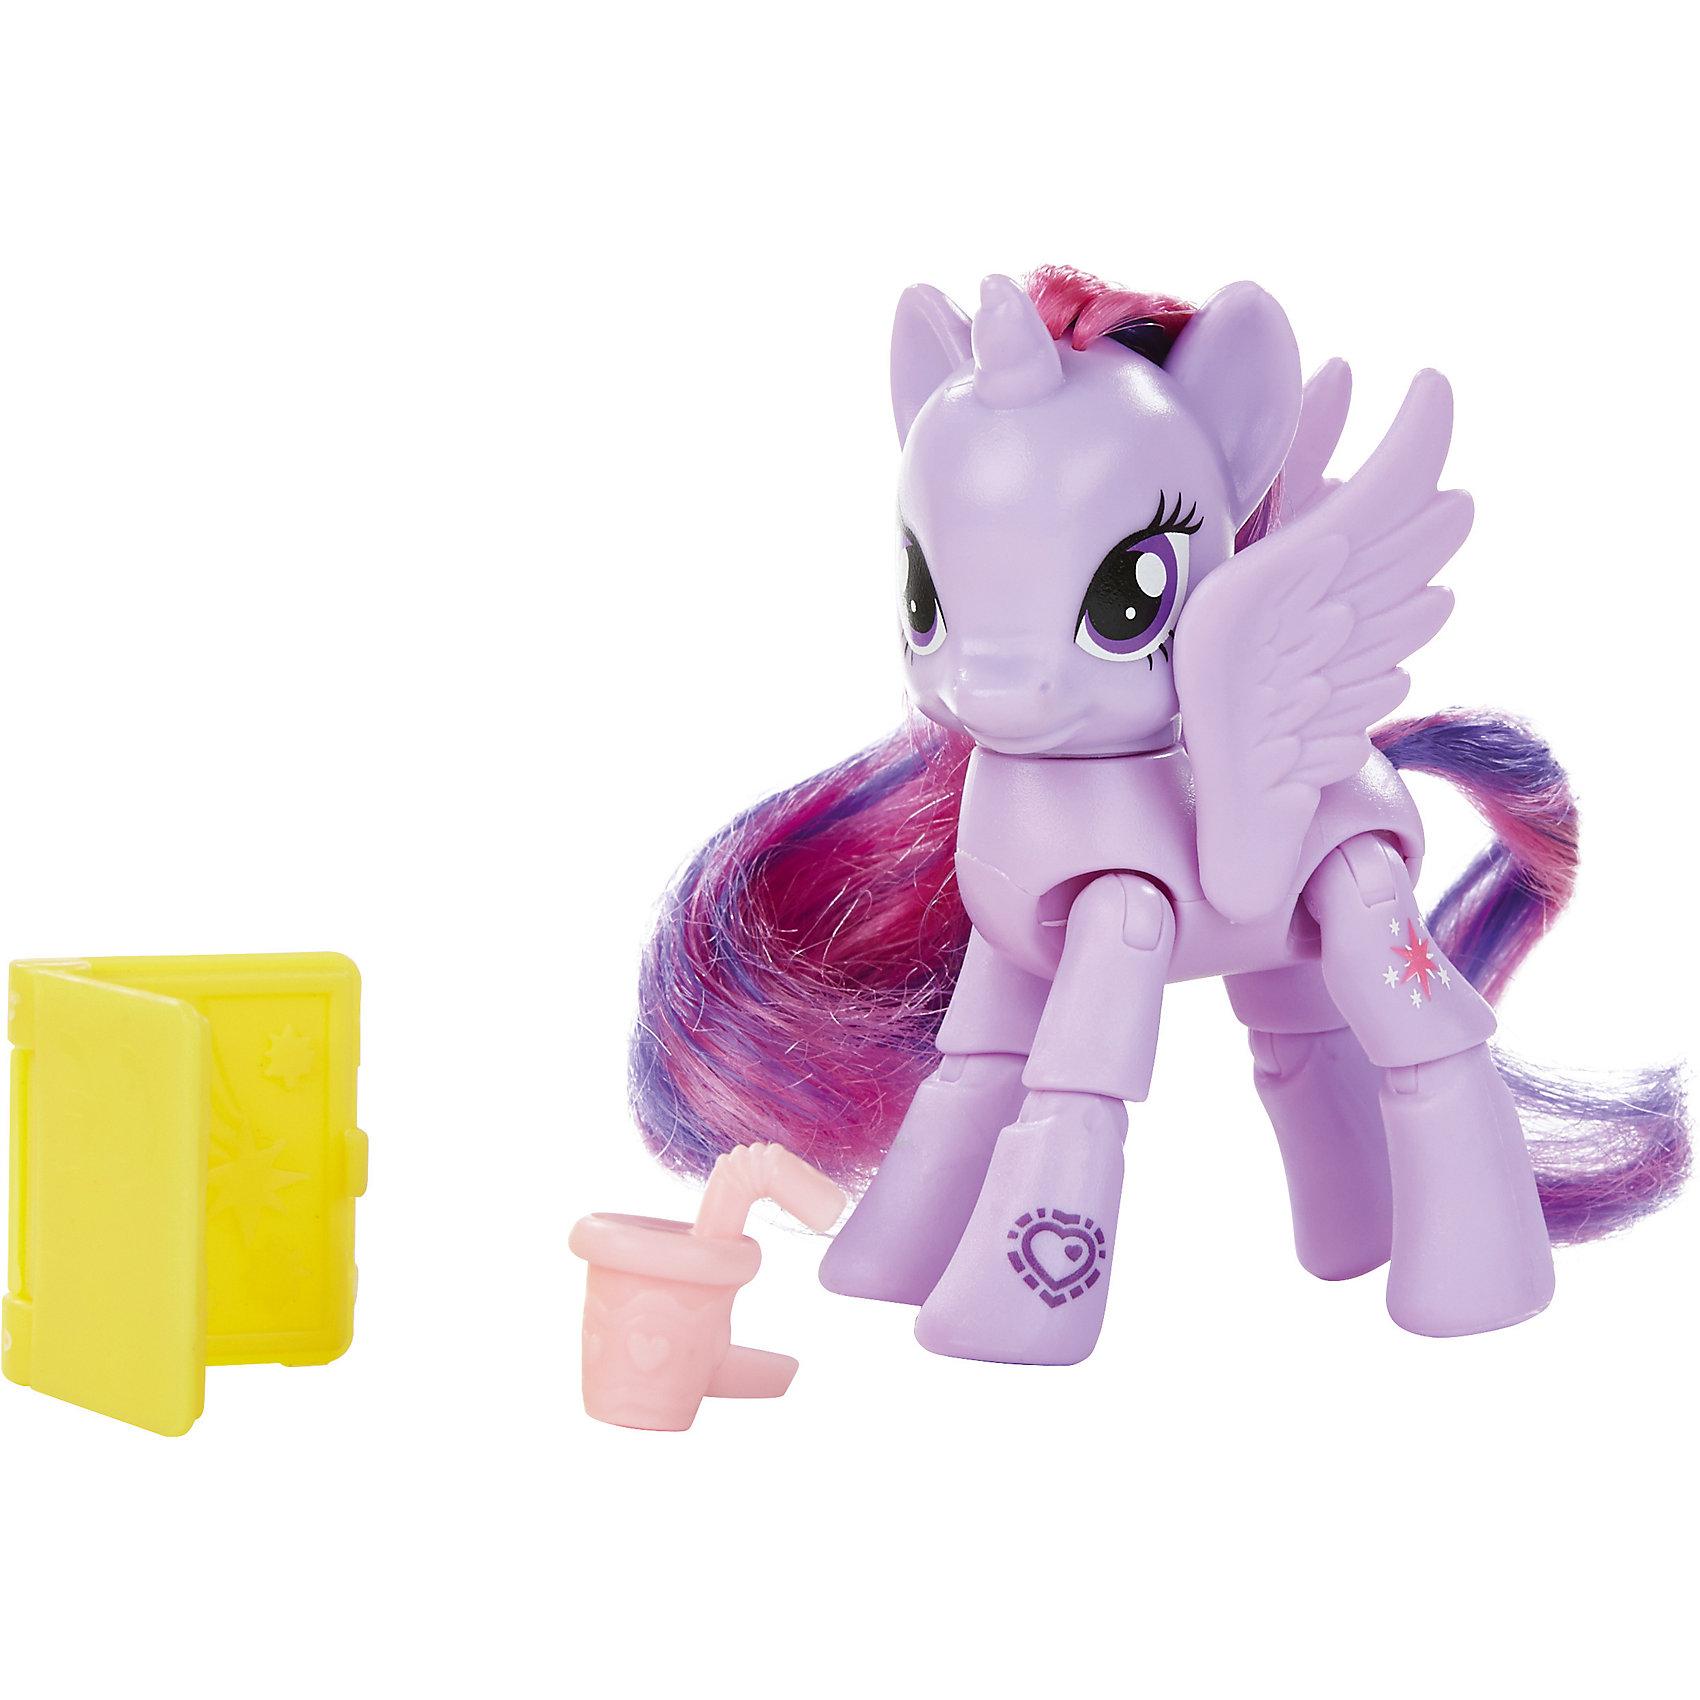 Hasbro Принцесса Твайлайт Спаркл, Дружба - это чудо!, My little Pony hasbro коллекционный игровой мини набор пони твайлайт спаркл my little pony b3597 b5568